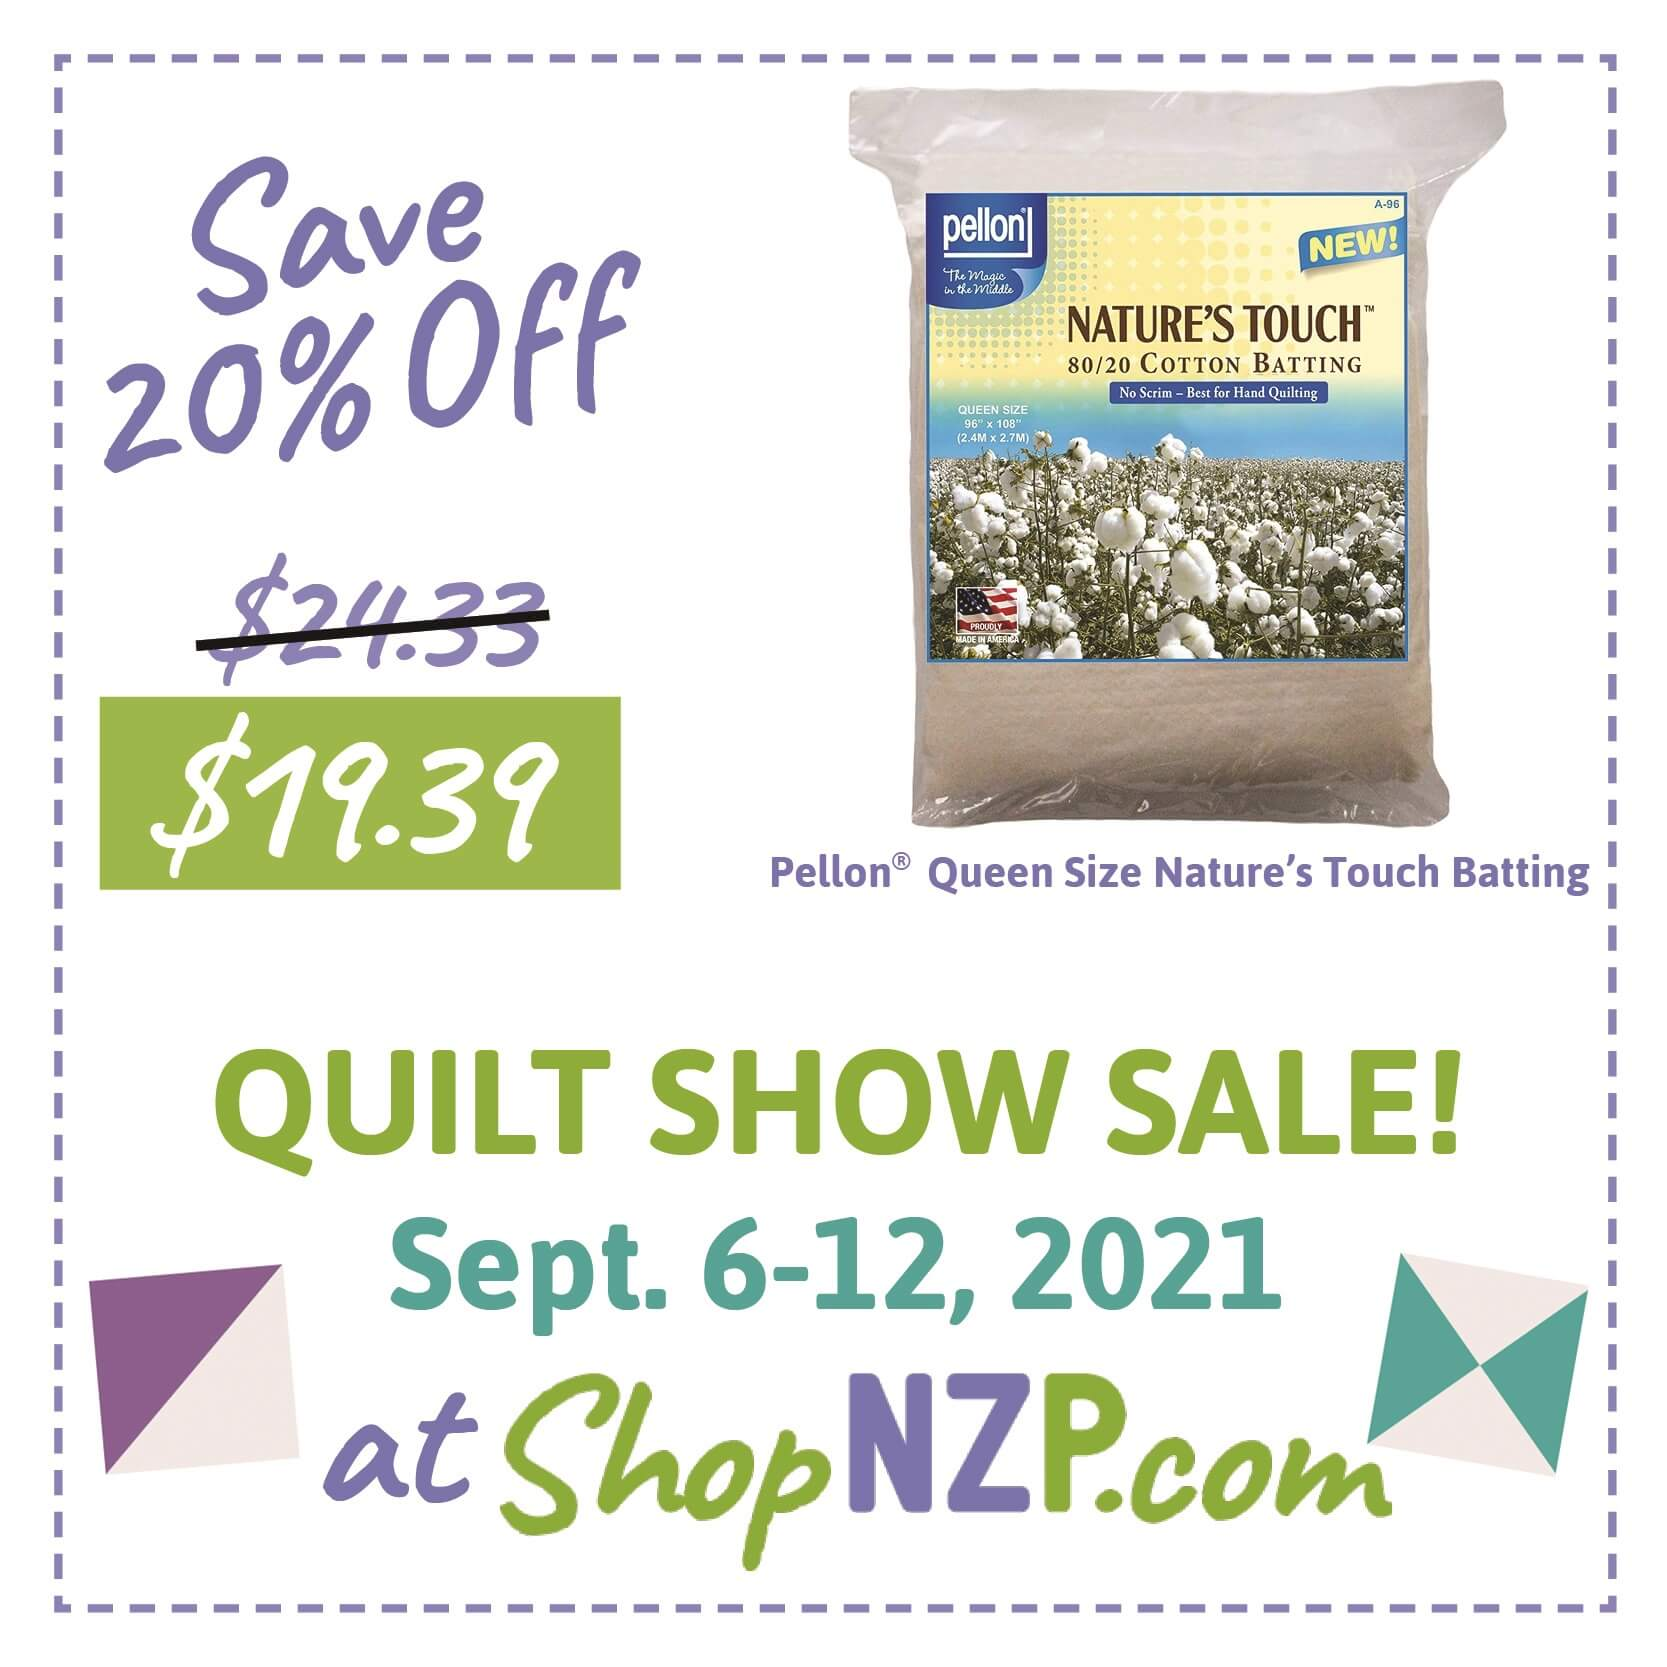 Save 20 Percent off Pellon Queen Size Nature's Touch Batting at Nancy Zieman Productions at ShopNZP